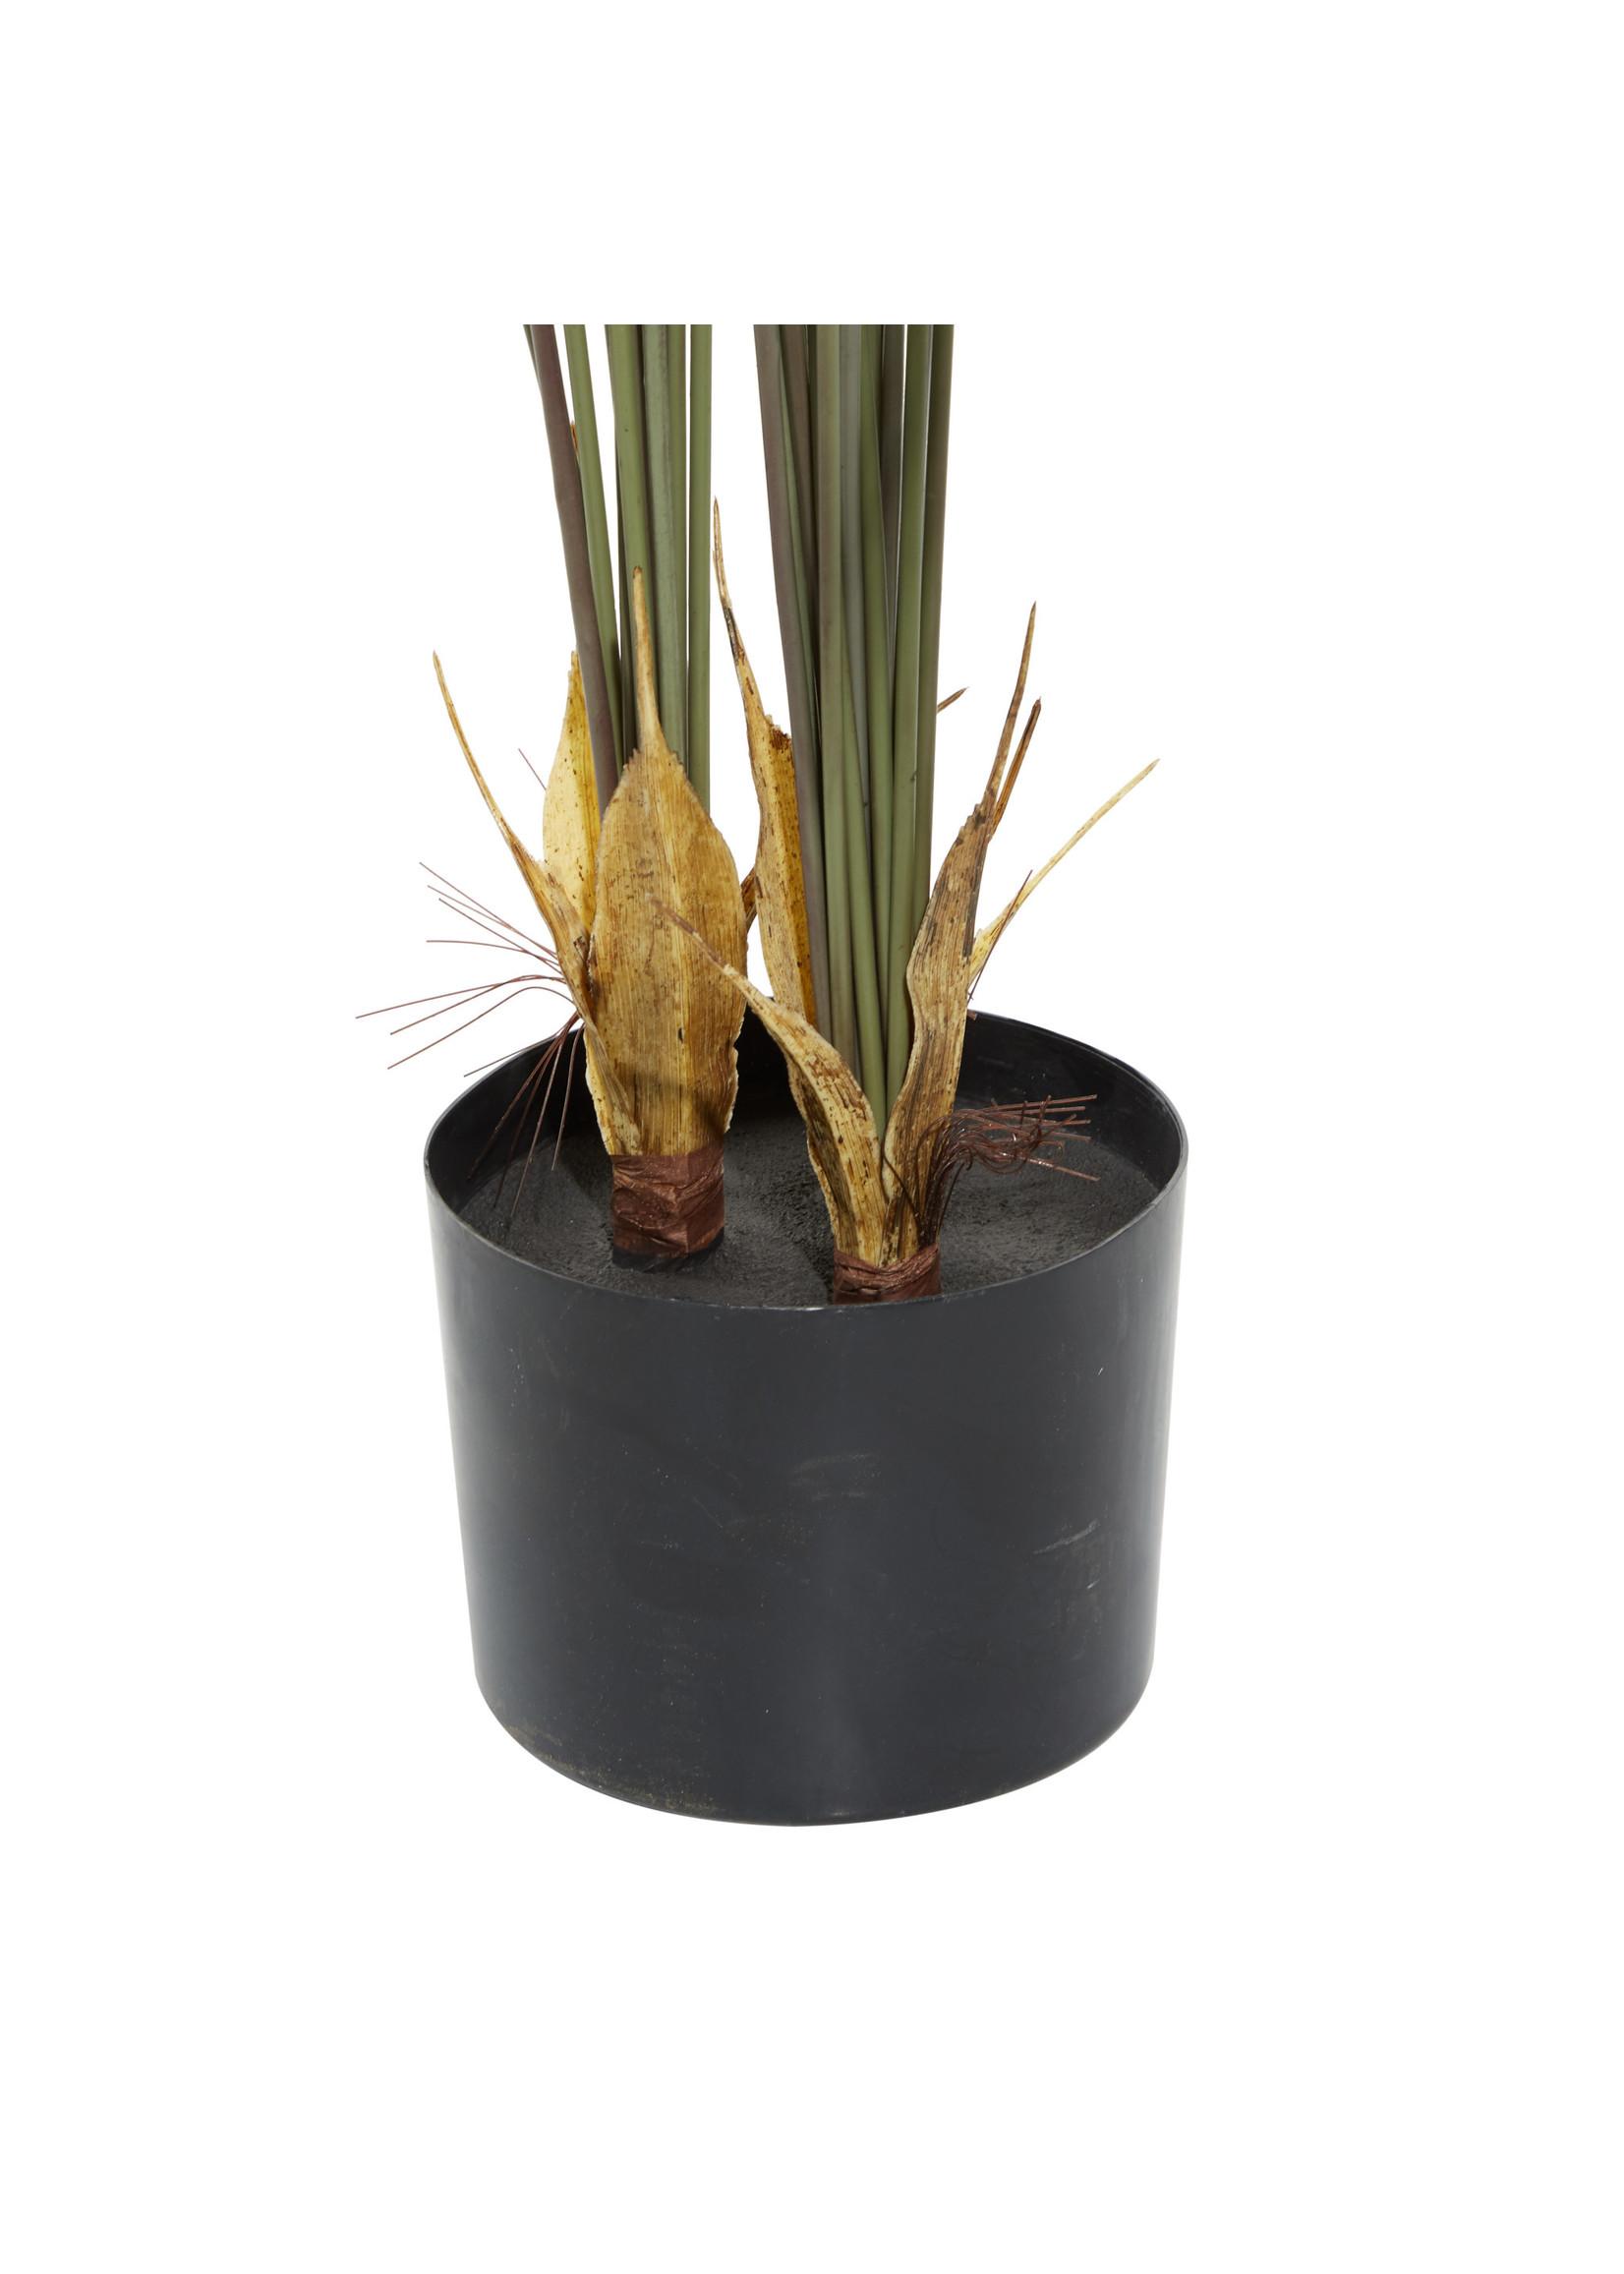 UMA Enterprises Artificial Kwai Leaves in Pot